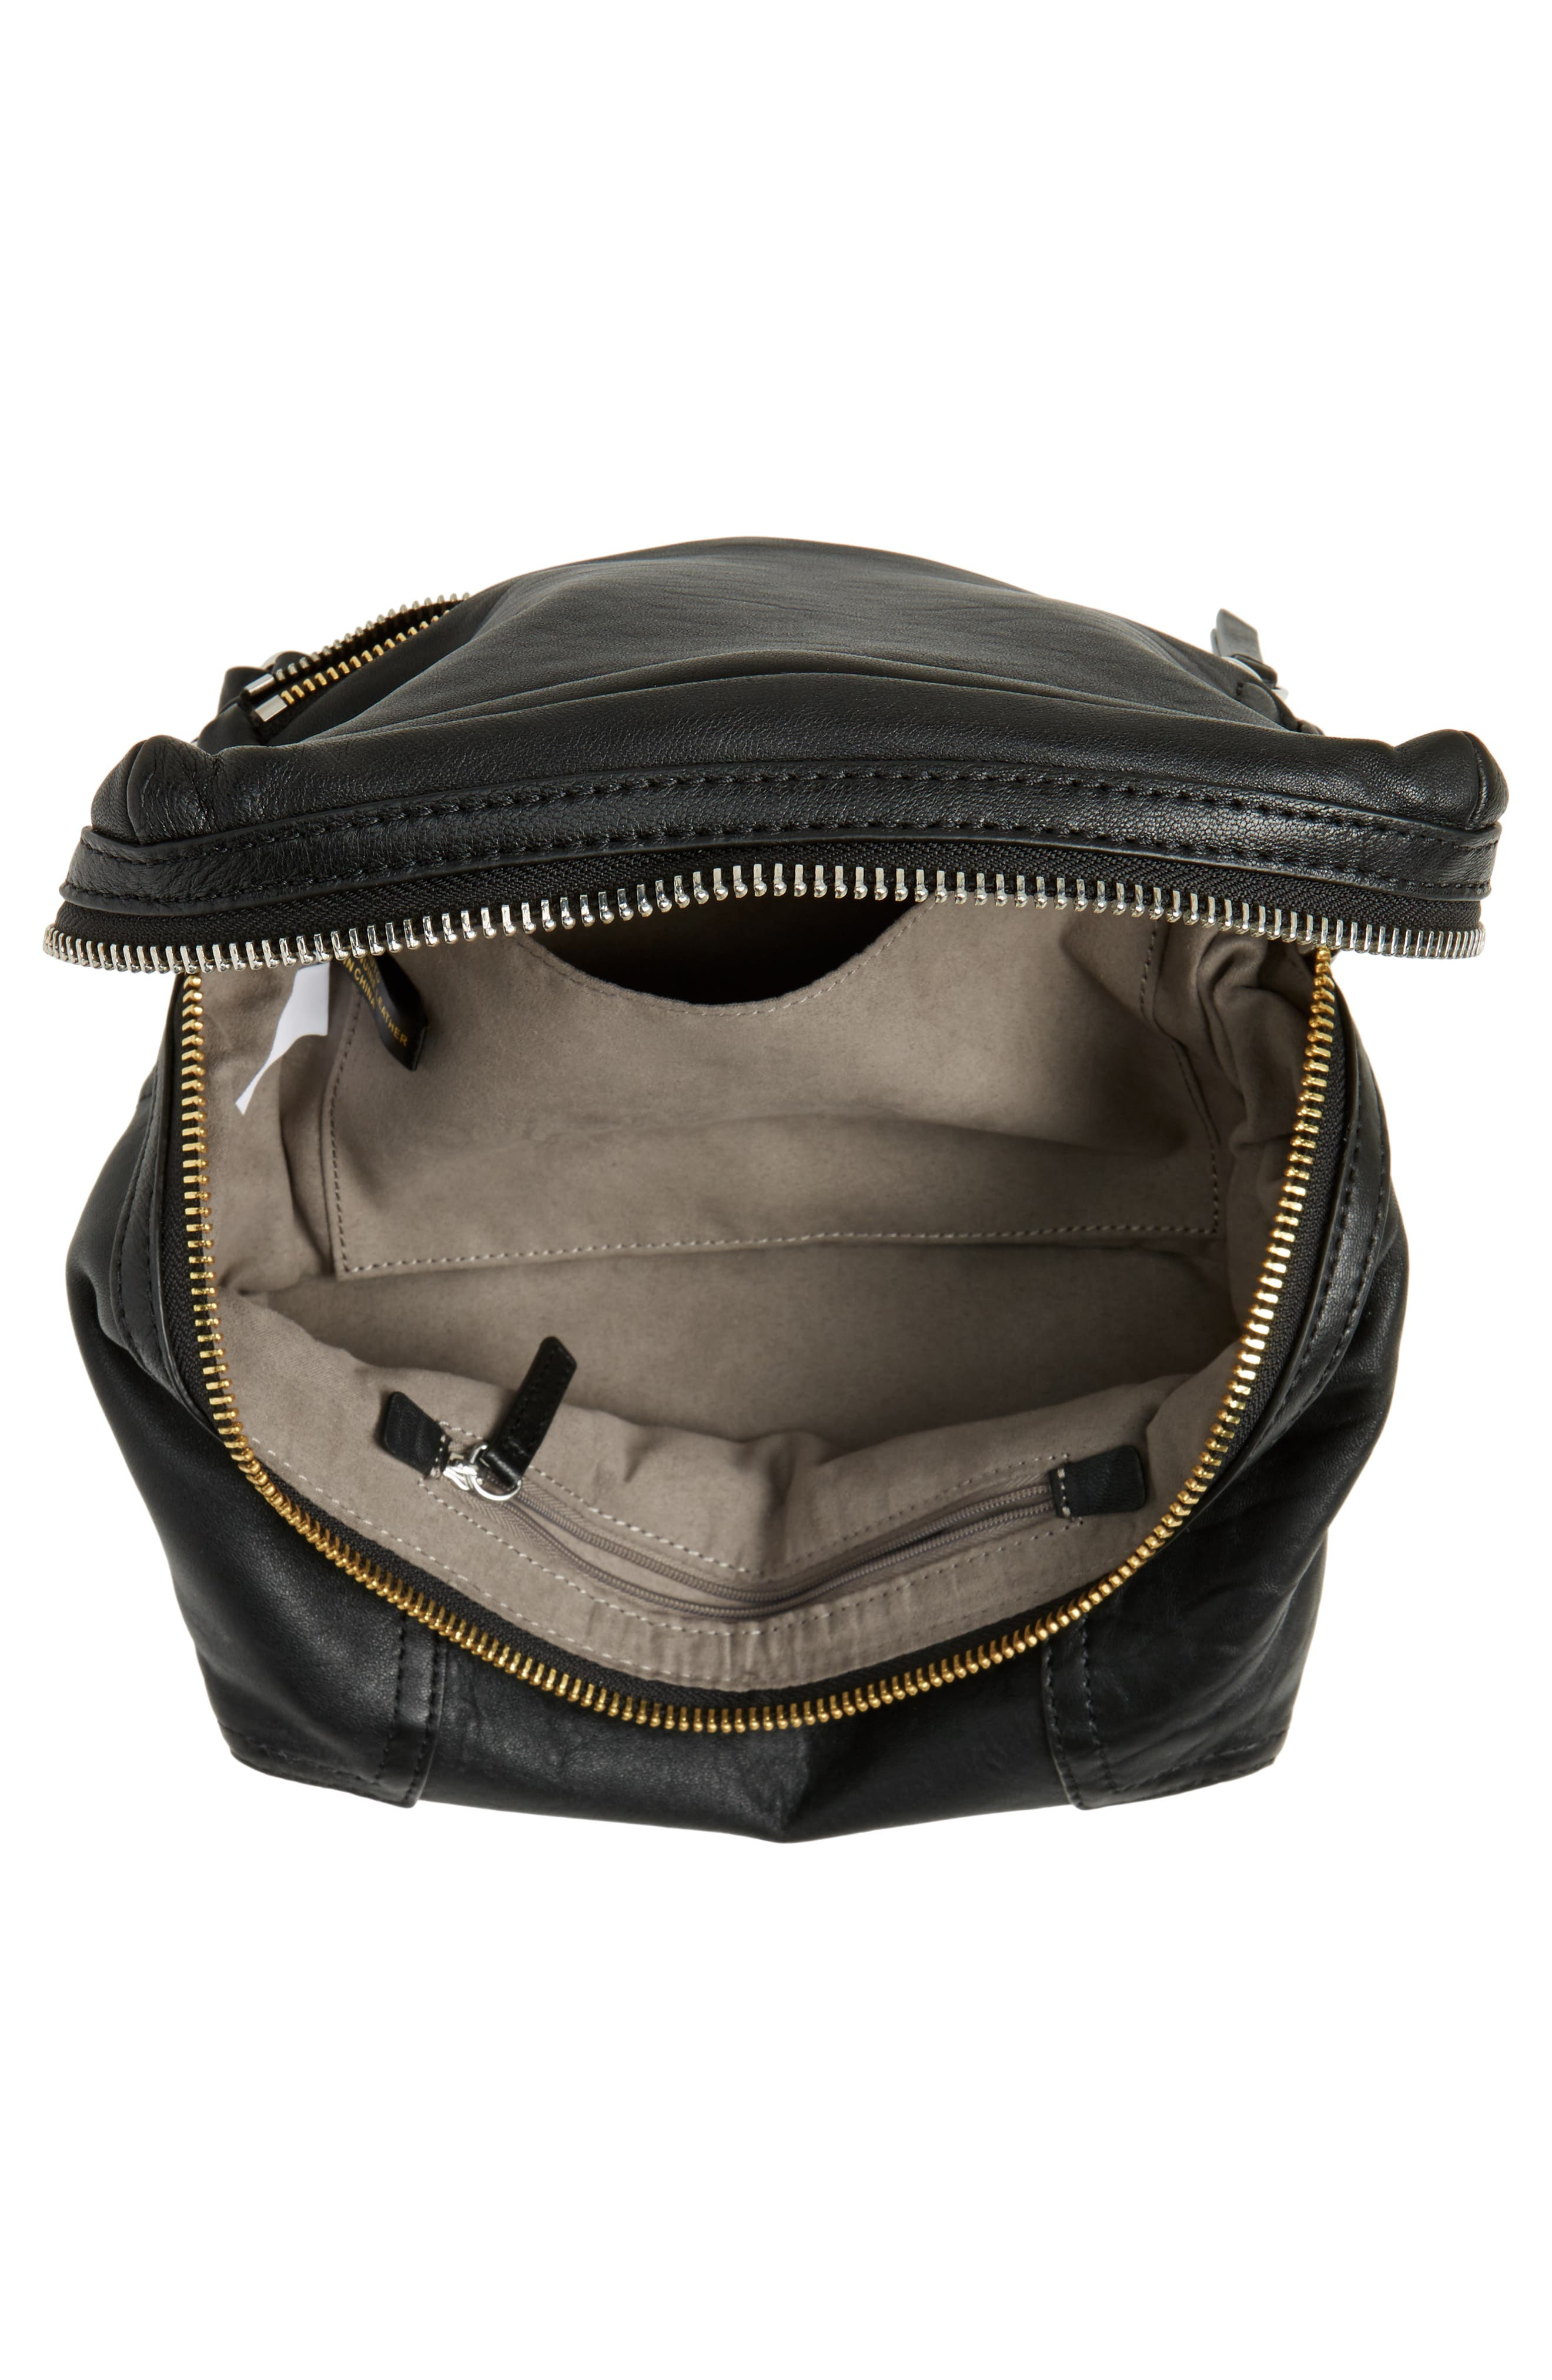 Medium Patch Leather Crossbody Bag,                             Alternate thumbnail 4, color,                             002